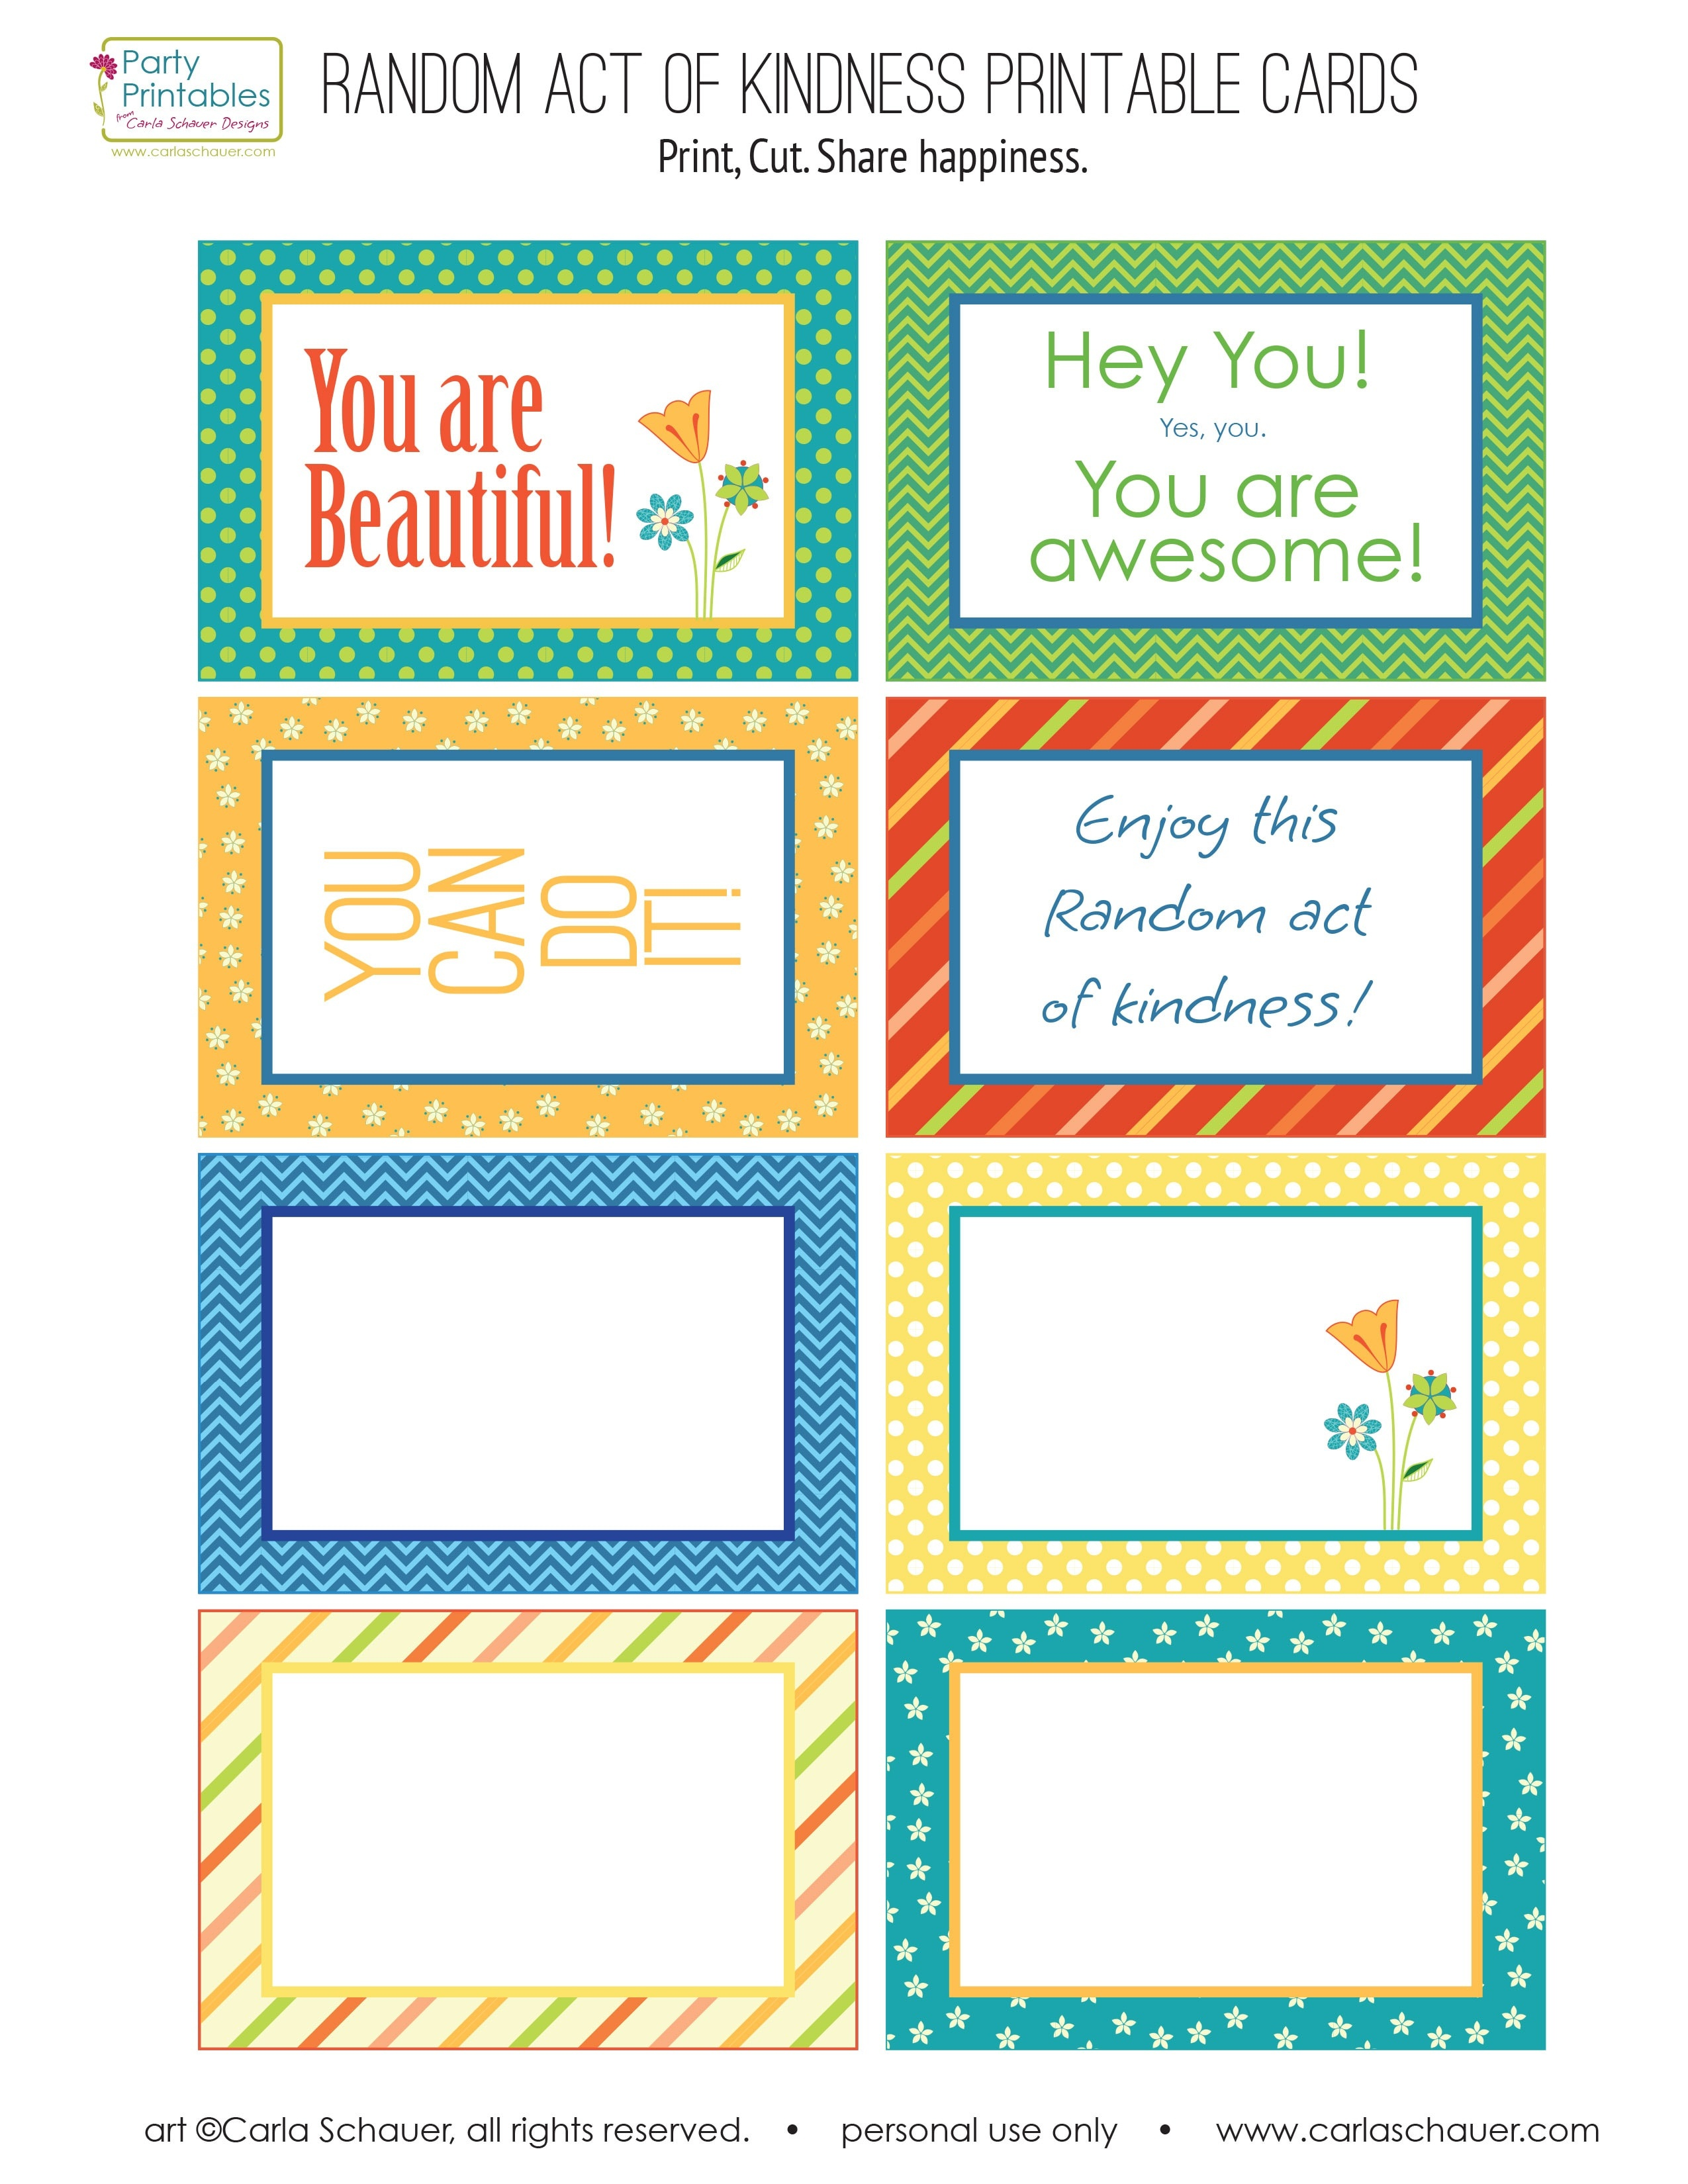 Random Act Of Kindness Free Printables   Carla Schauer Designs - Free Printable Kindness Cards